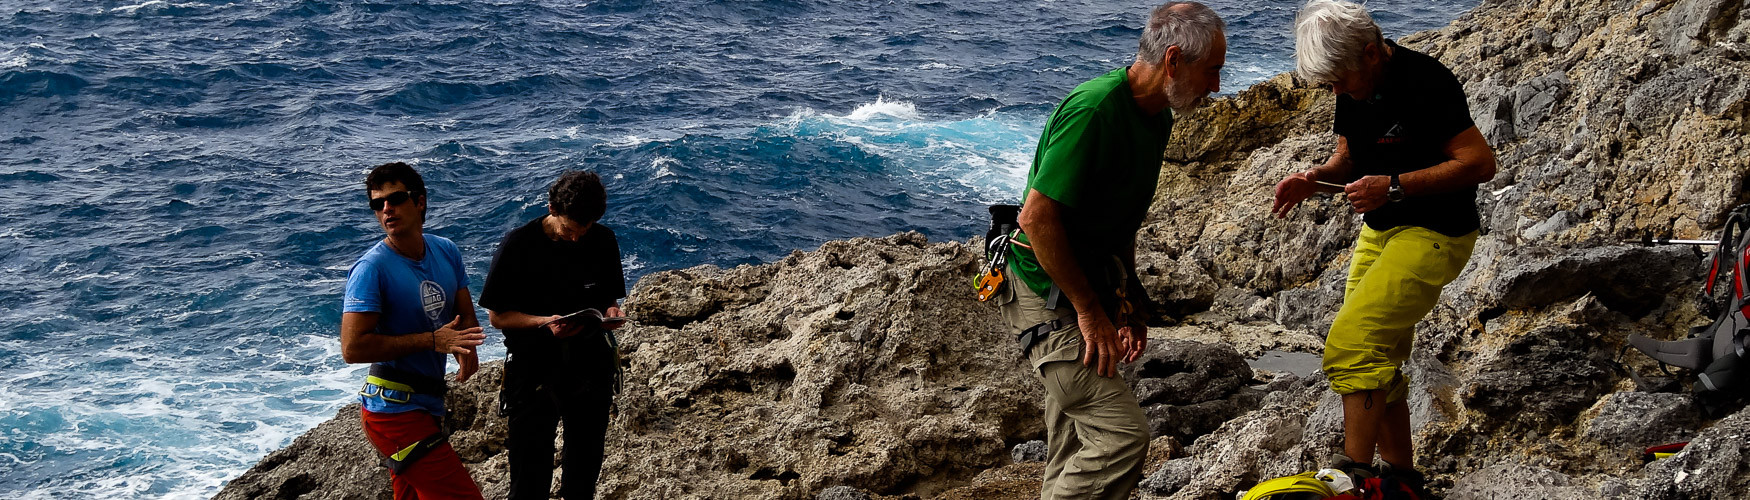 Klettern am Meer Kletterreise